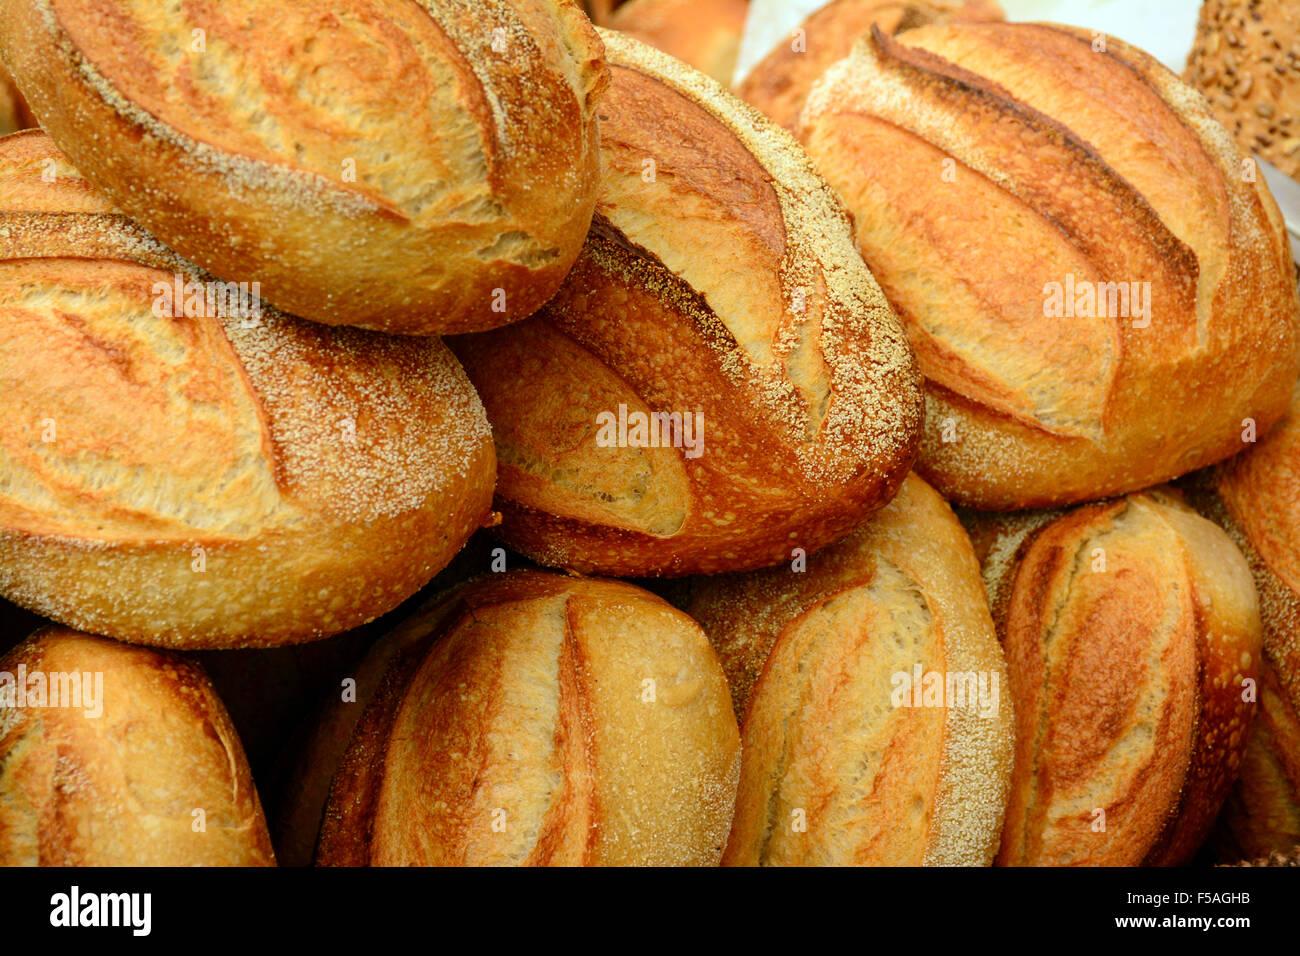 Fresh buns - Stock Image